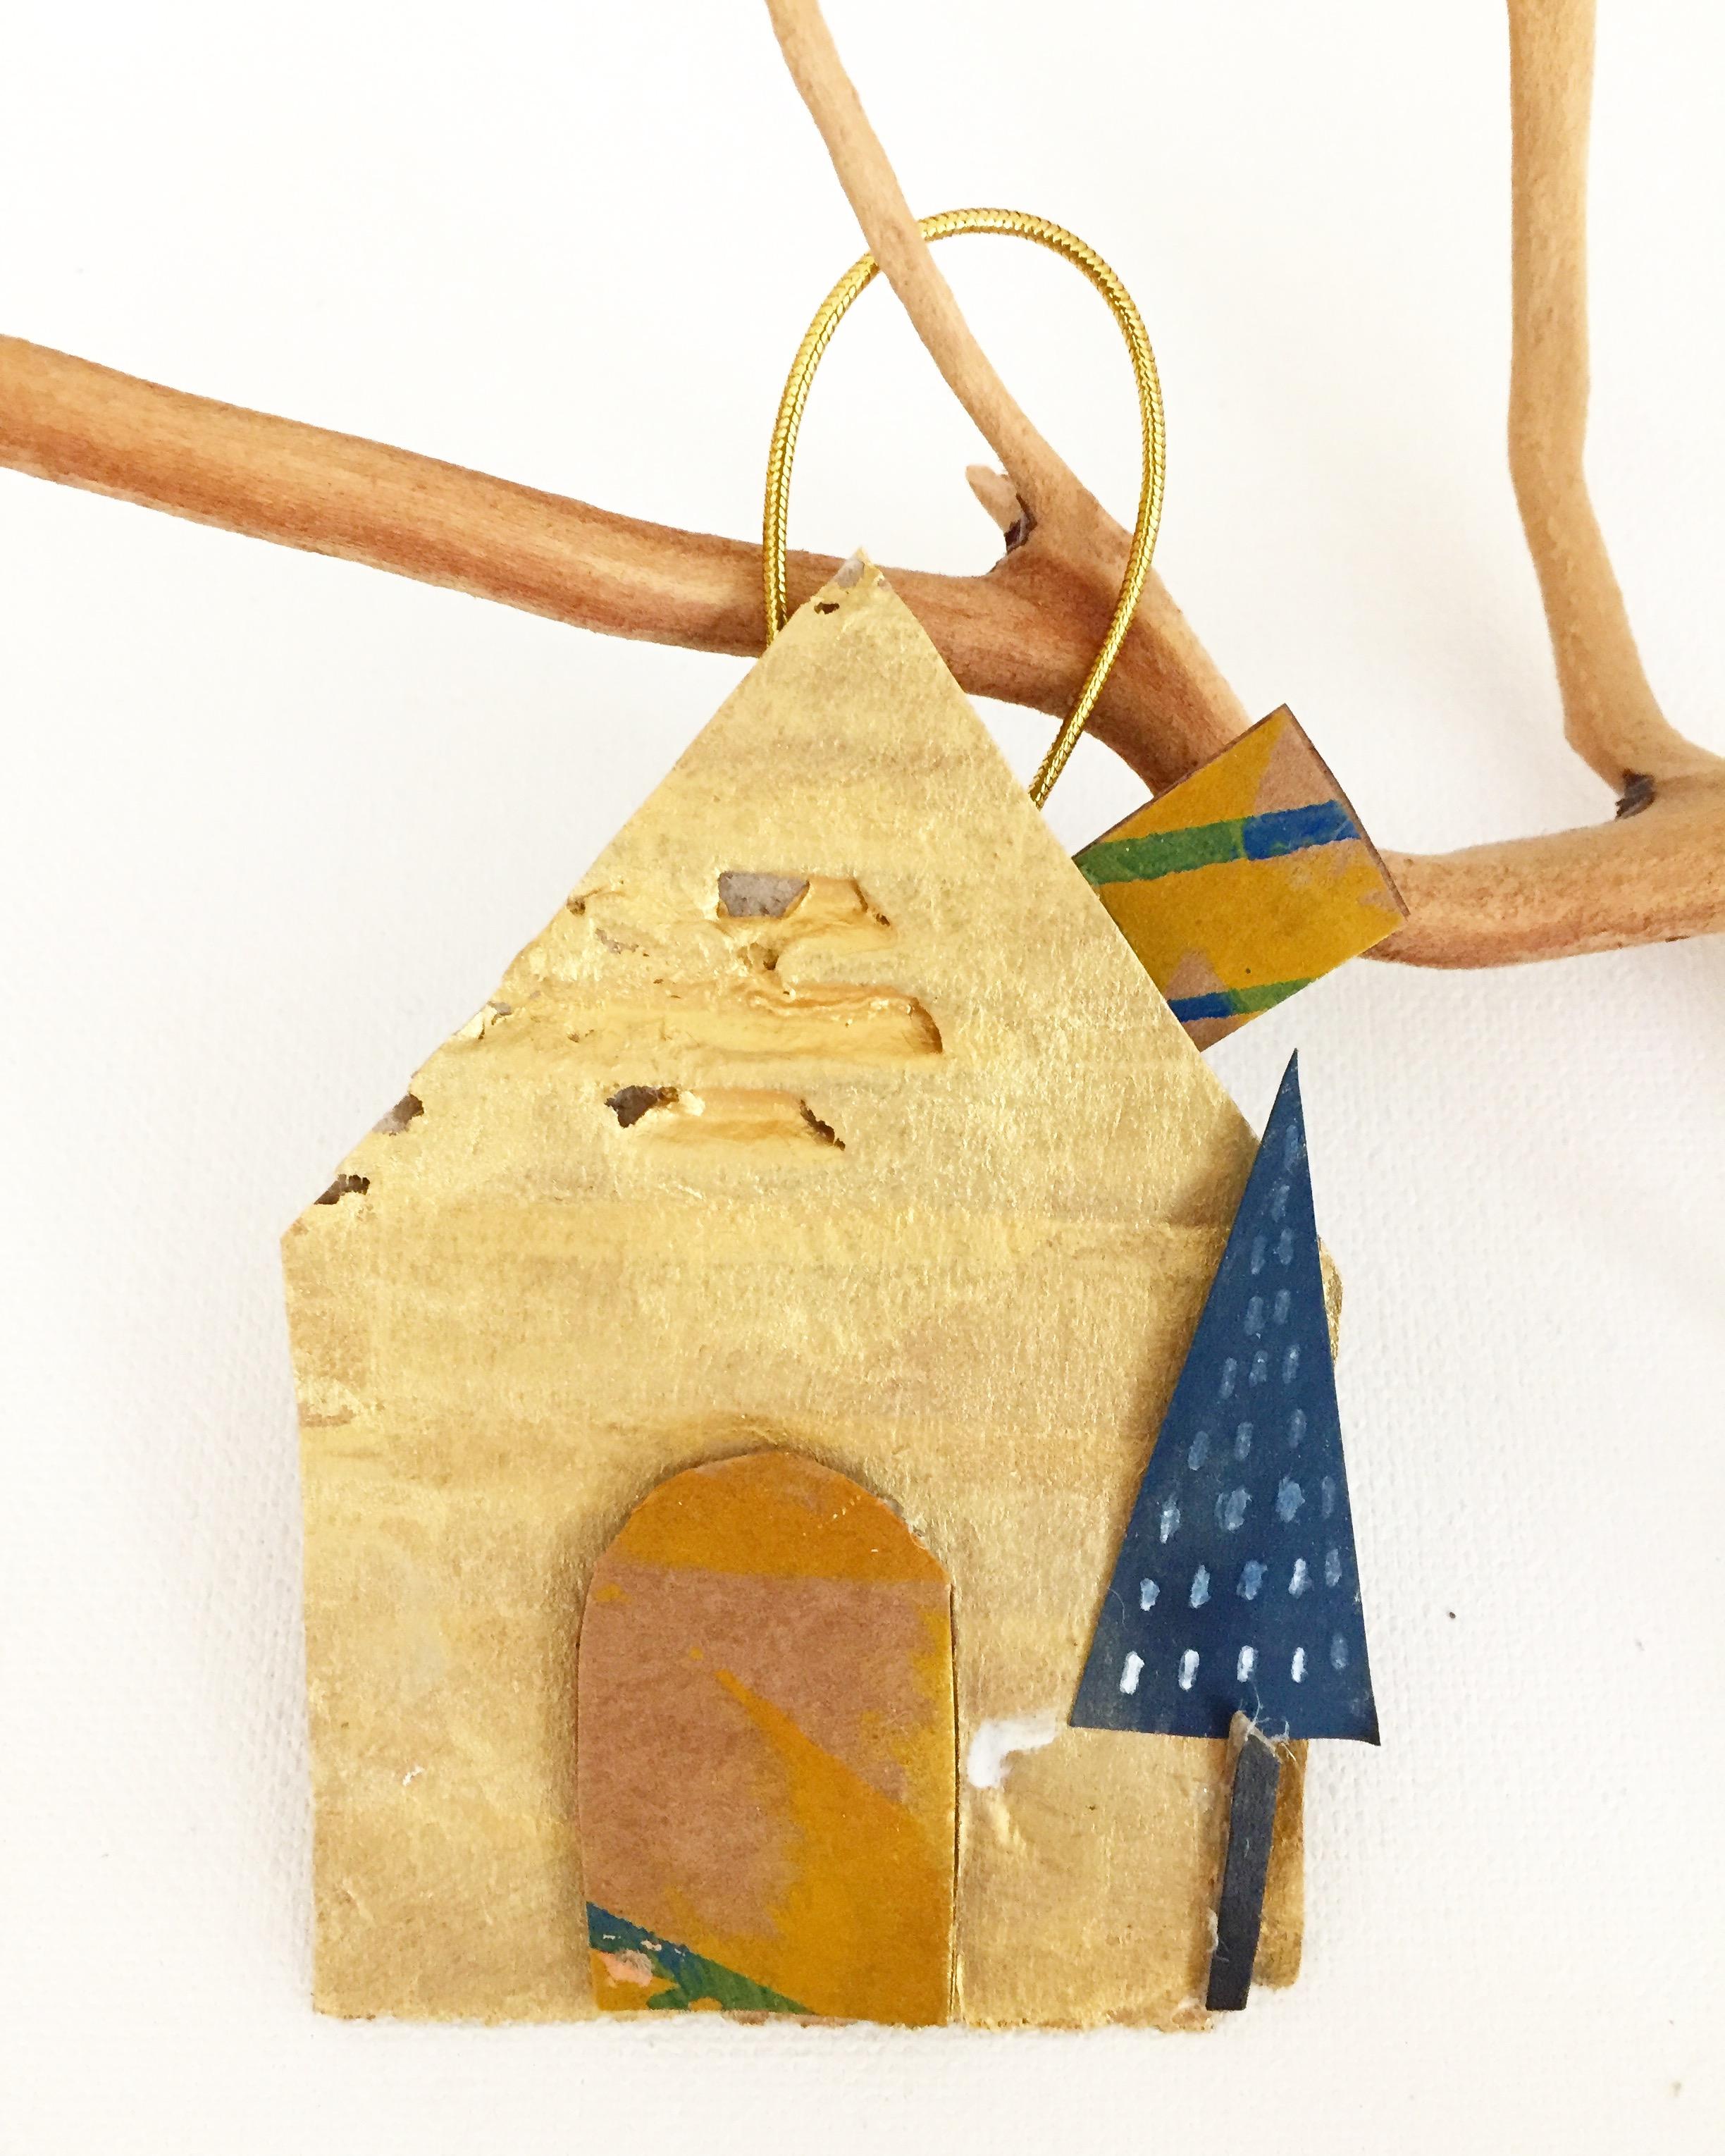 Cardboard House Ornament - 8